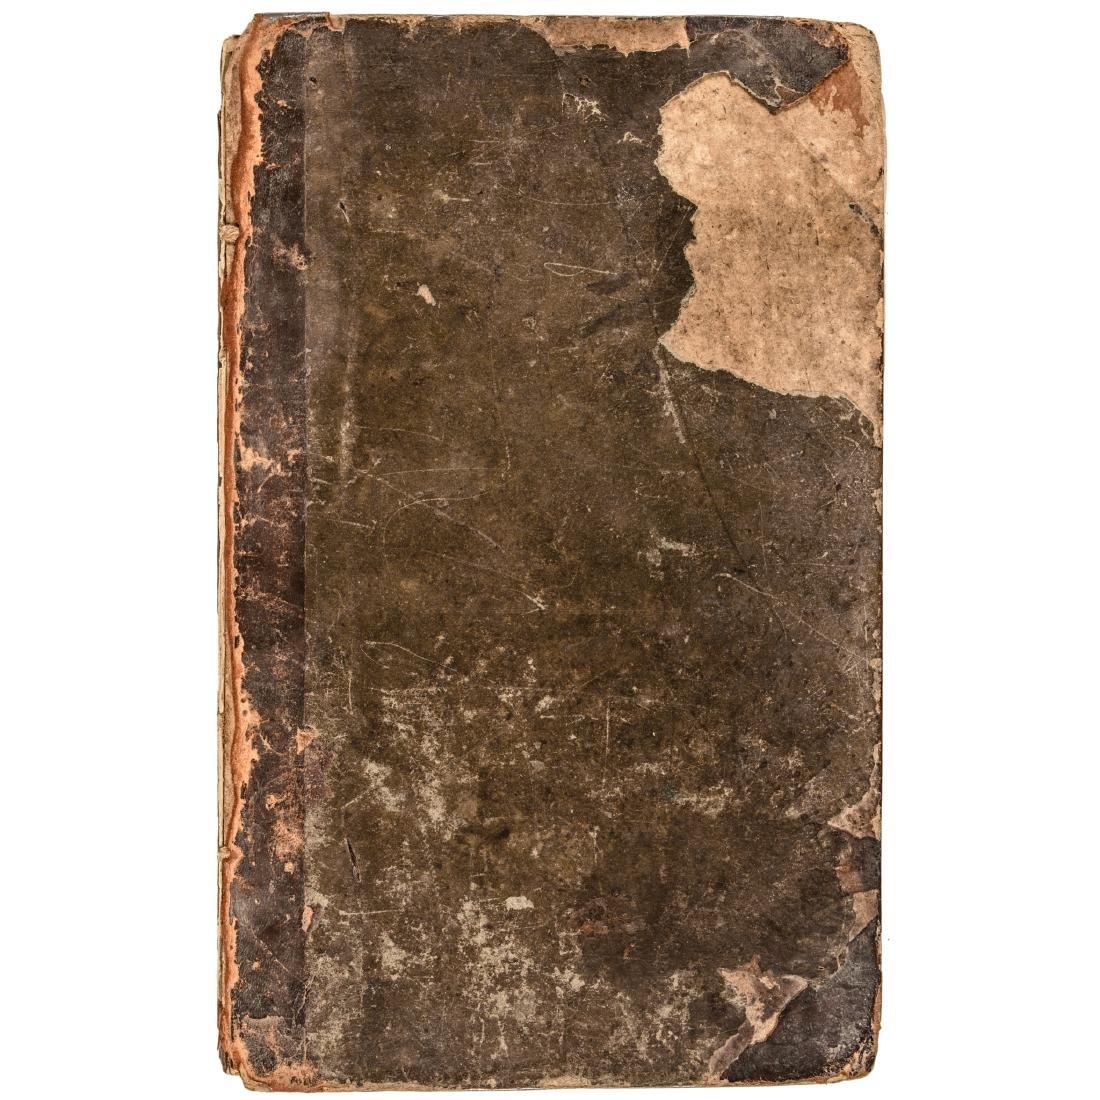 1814 The Star Spangled Banner, Francis Scott Key! - 5